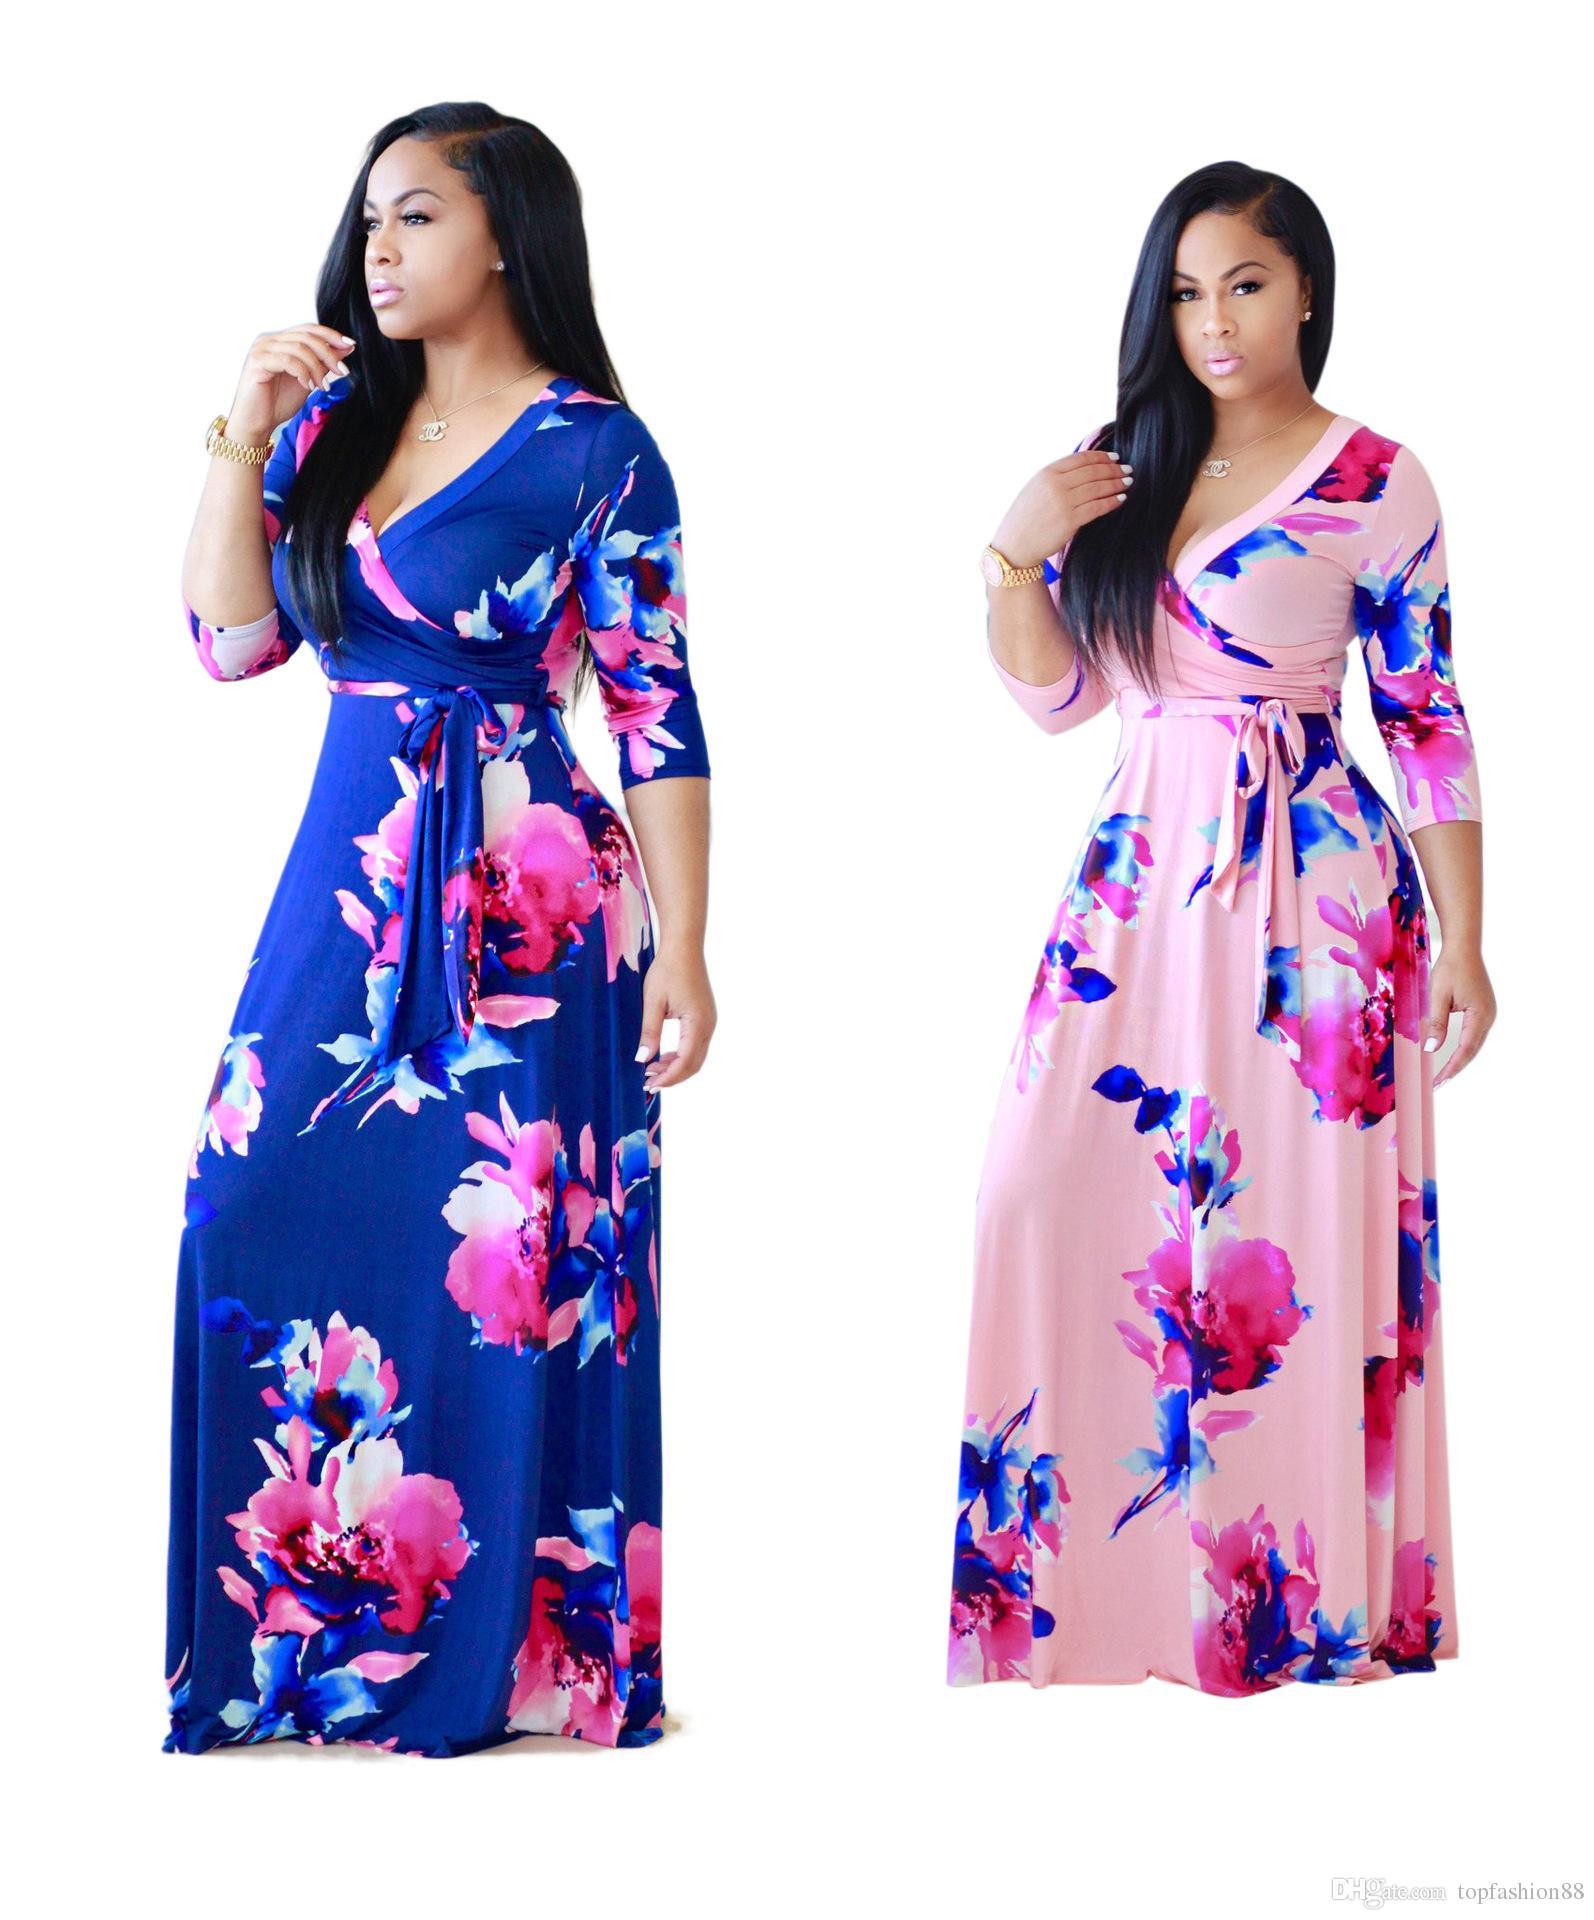 Womens Fashion V Neck Floral Printed Slim Long Maxi Dresses For Female Sexy  Long Sleeve Bodycon Bandage Floor Length Dress XL Silk Dress Women Dress  From ... 1de40d208